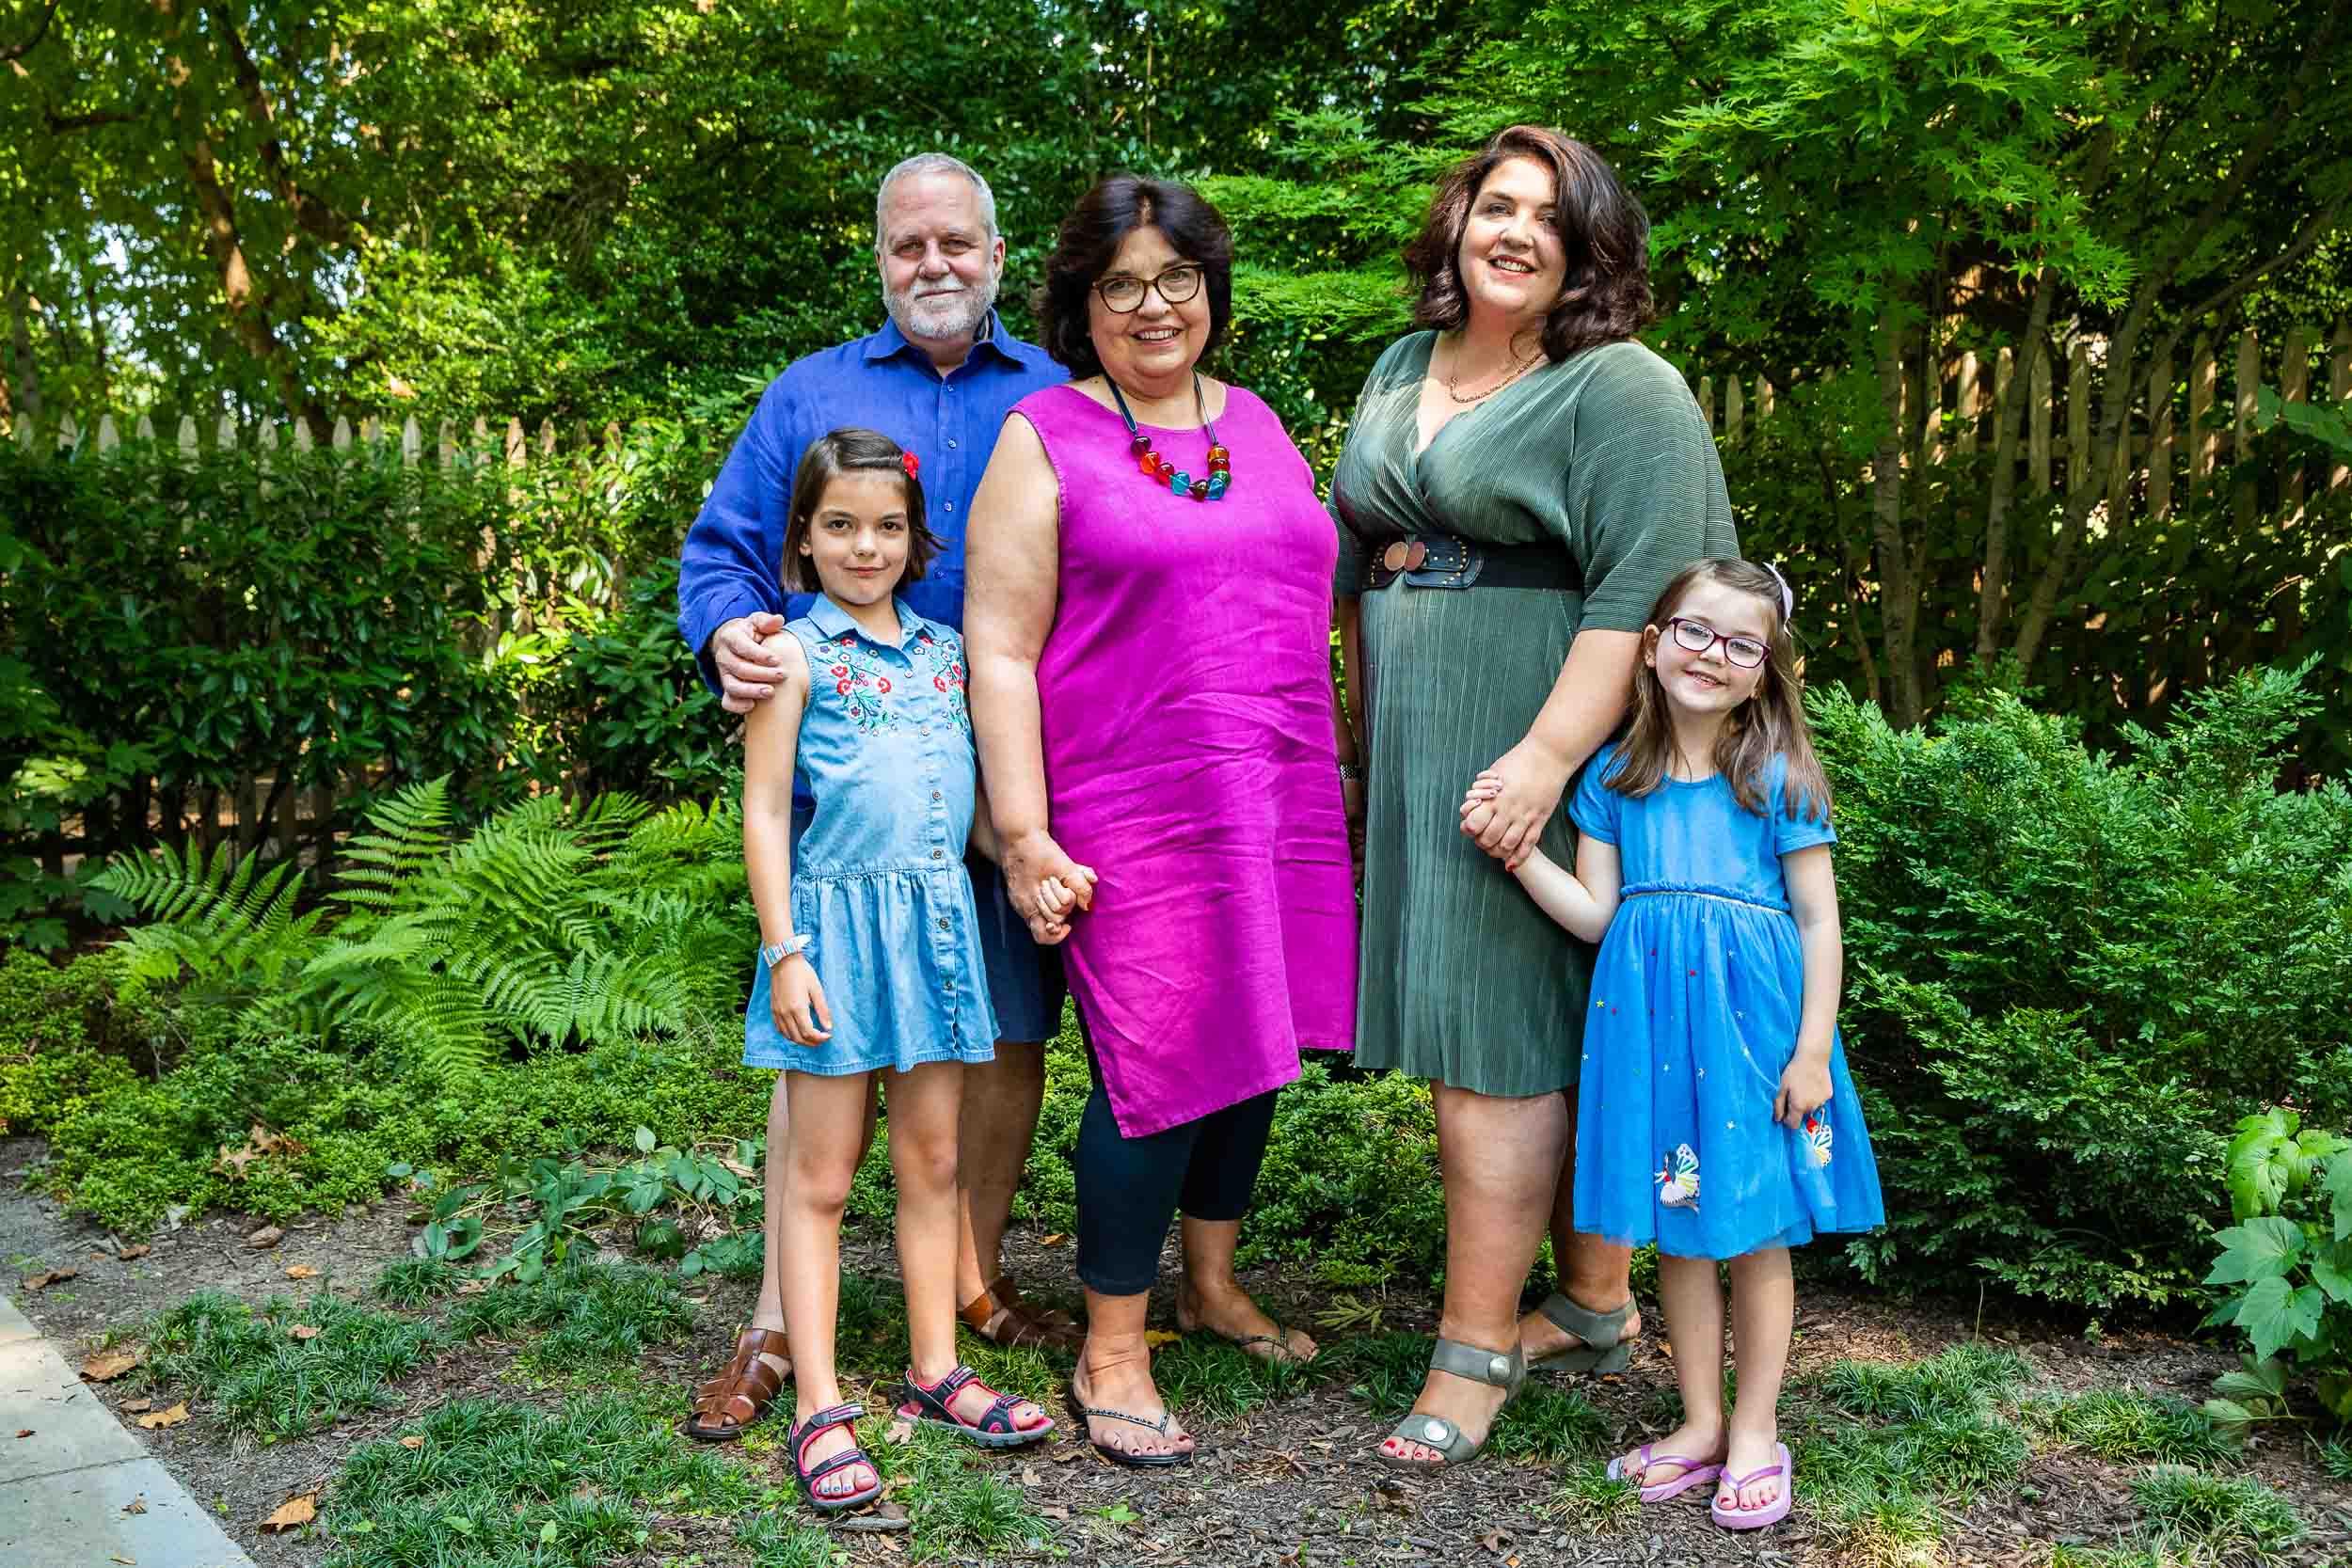 Chevy Chase MD Backyard Family Portraits Maryland Photography Tara Parekh Photography -04.jpg